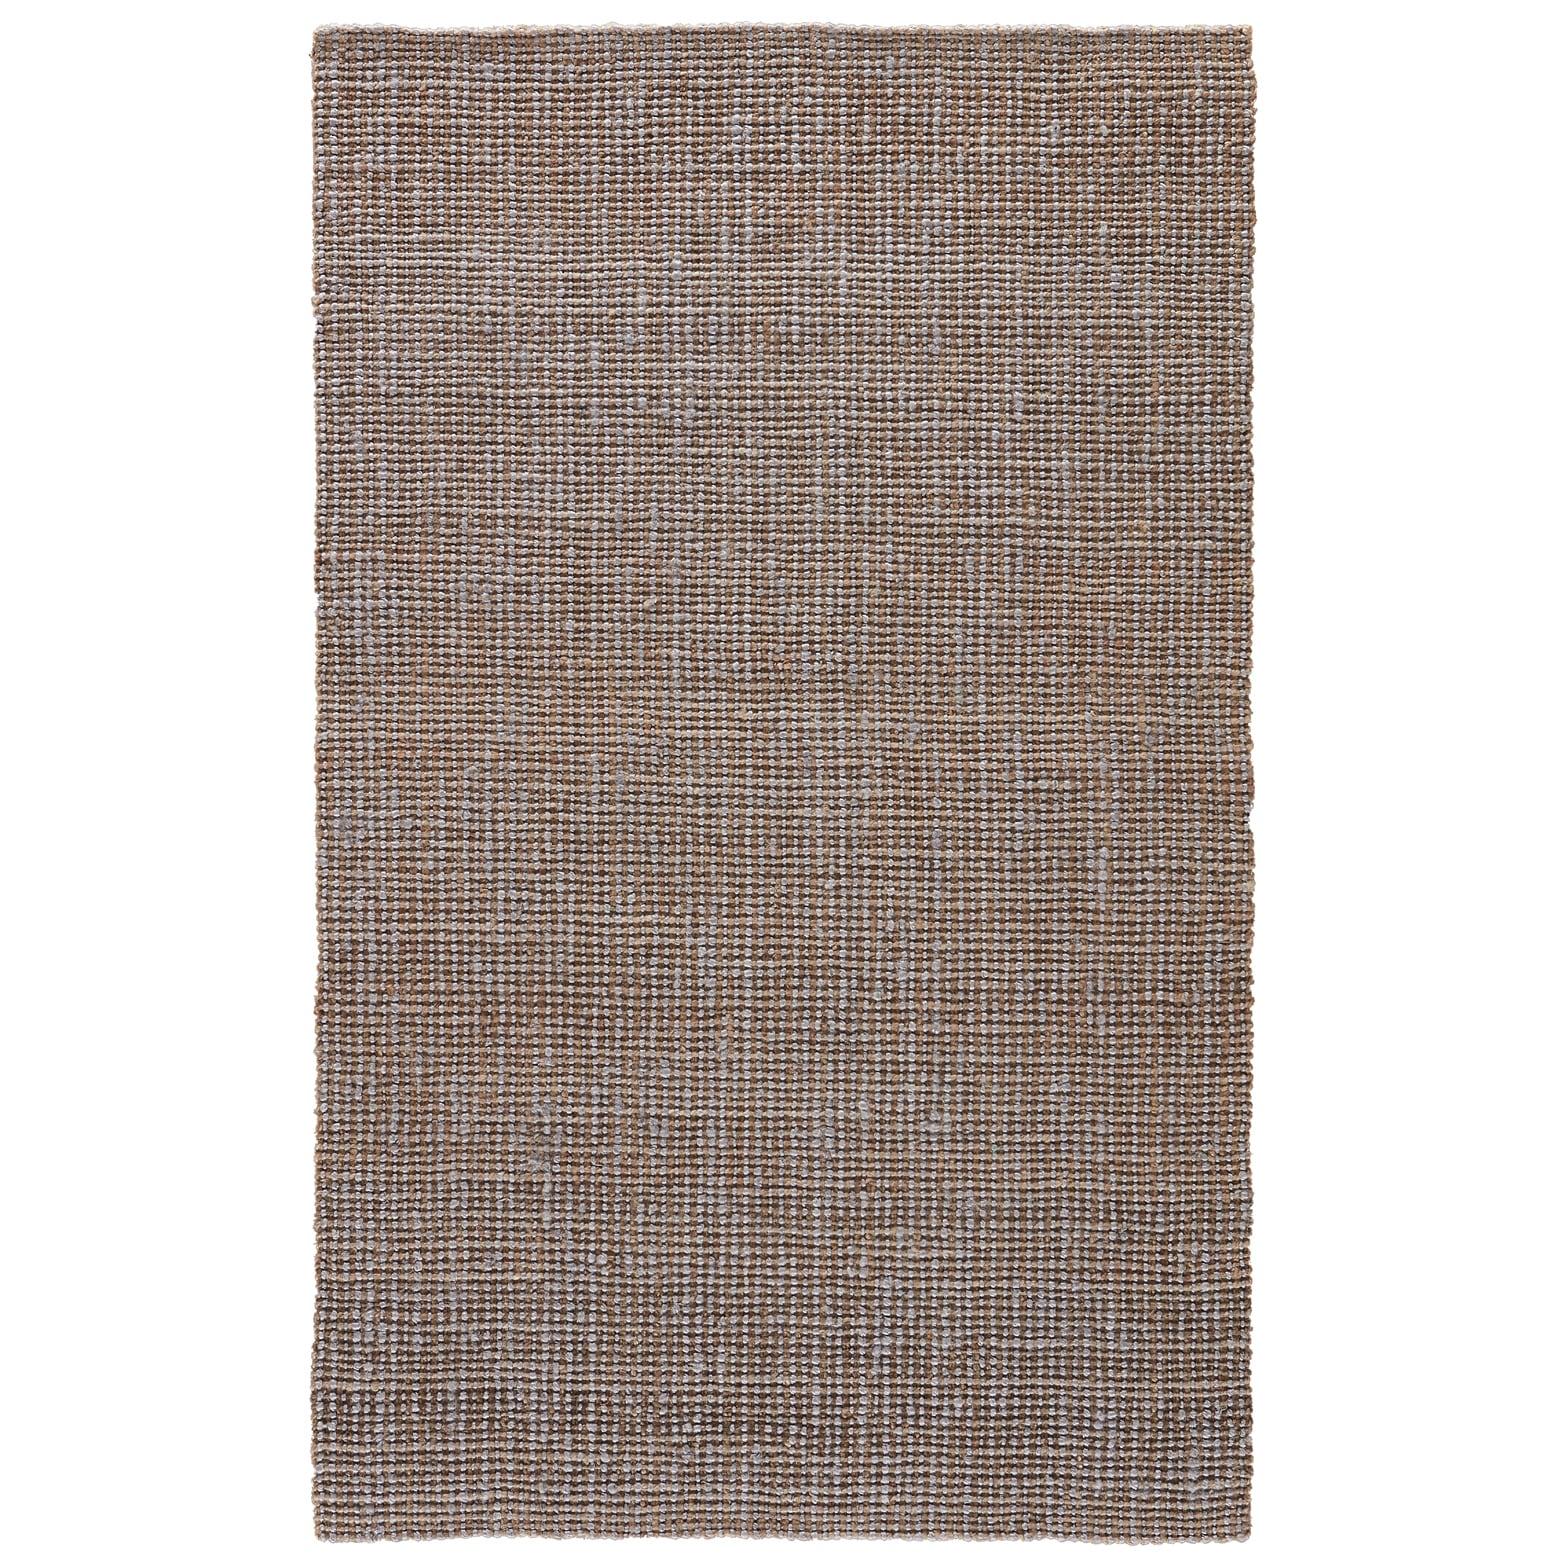 Juniper Home Mandeville Natural Solid Tan/ Gray Area Rug ...